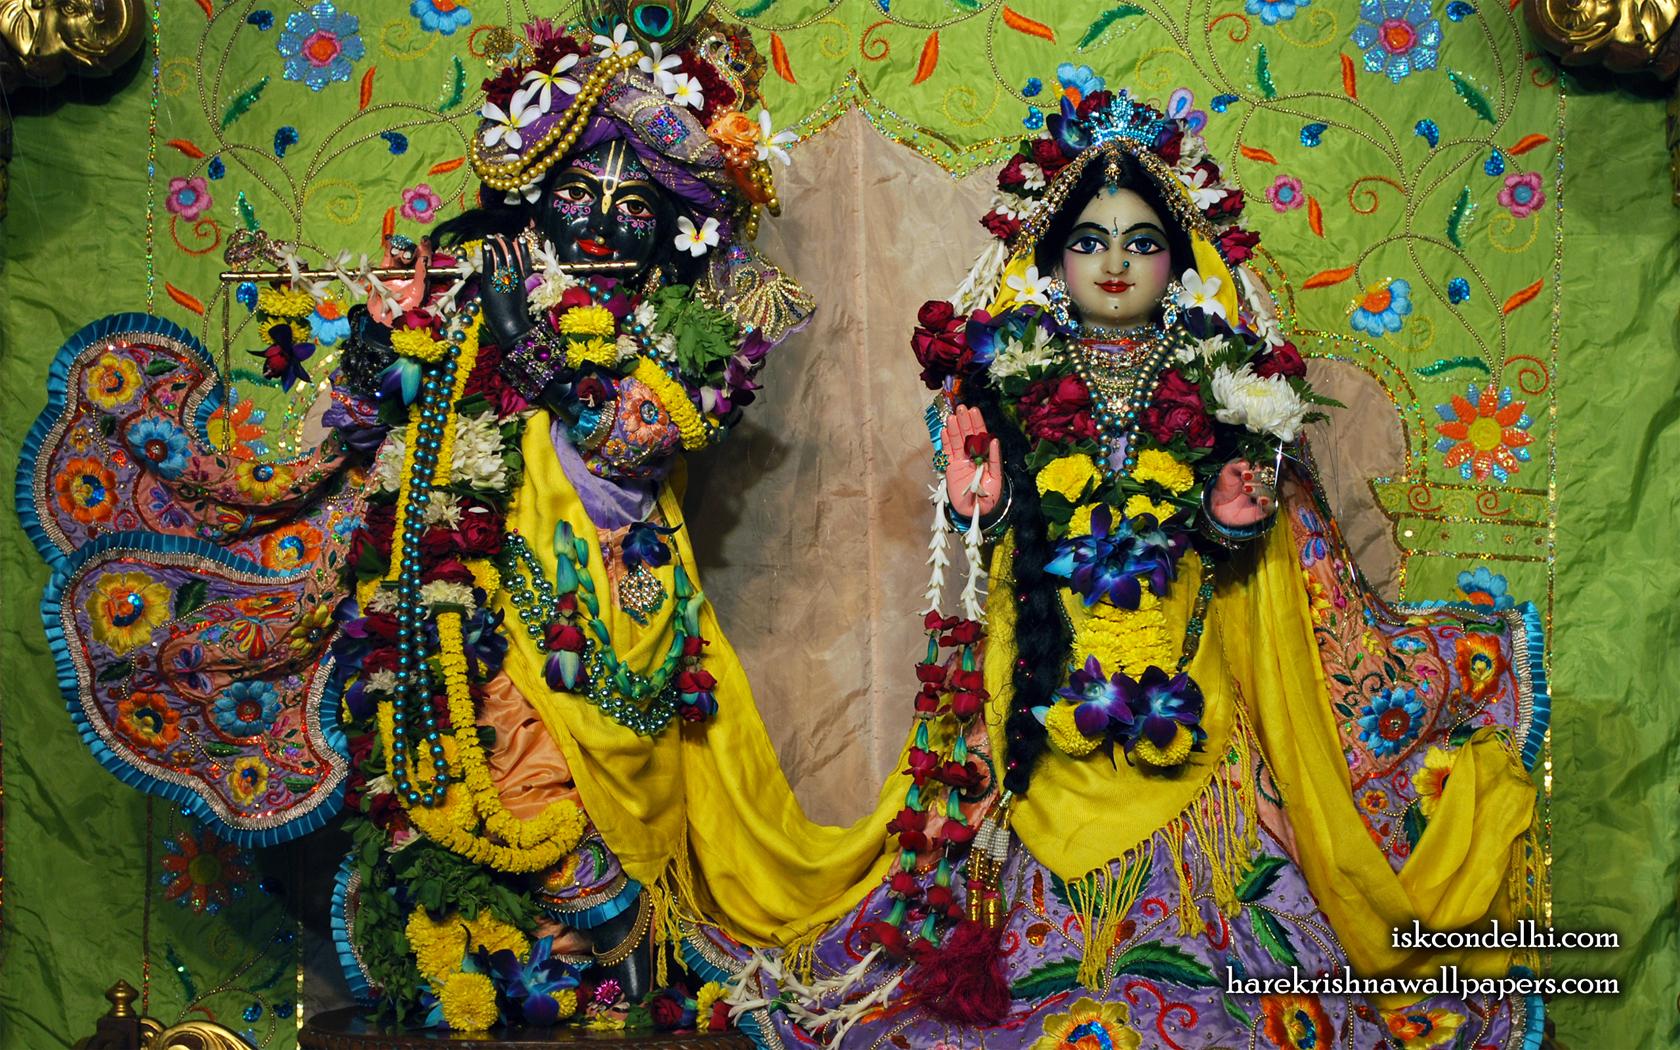 Sri Sri Radha Parthasarathi Wallpaper (008) Size 1680x1050 Download